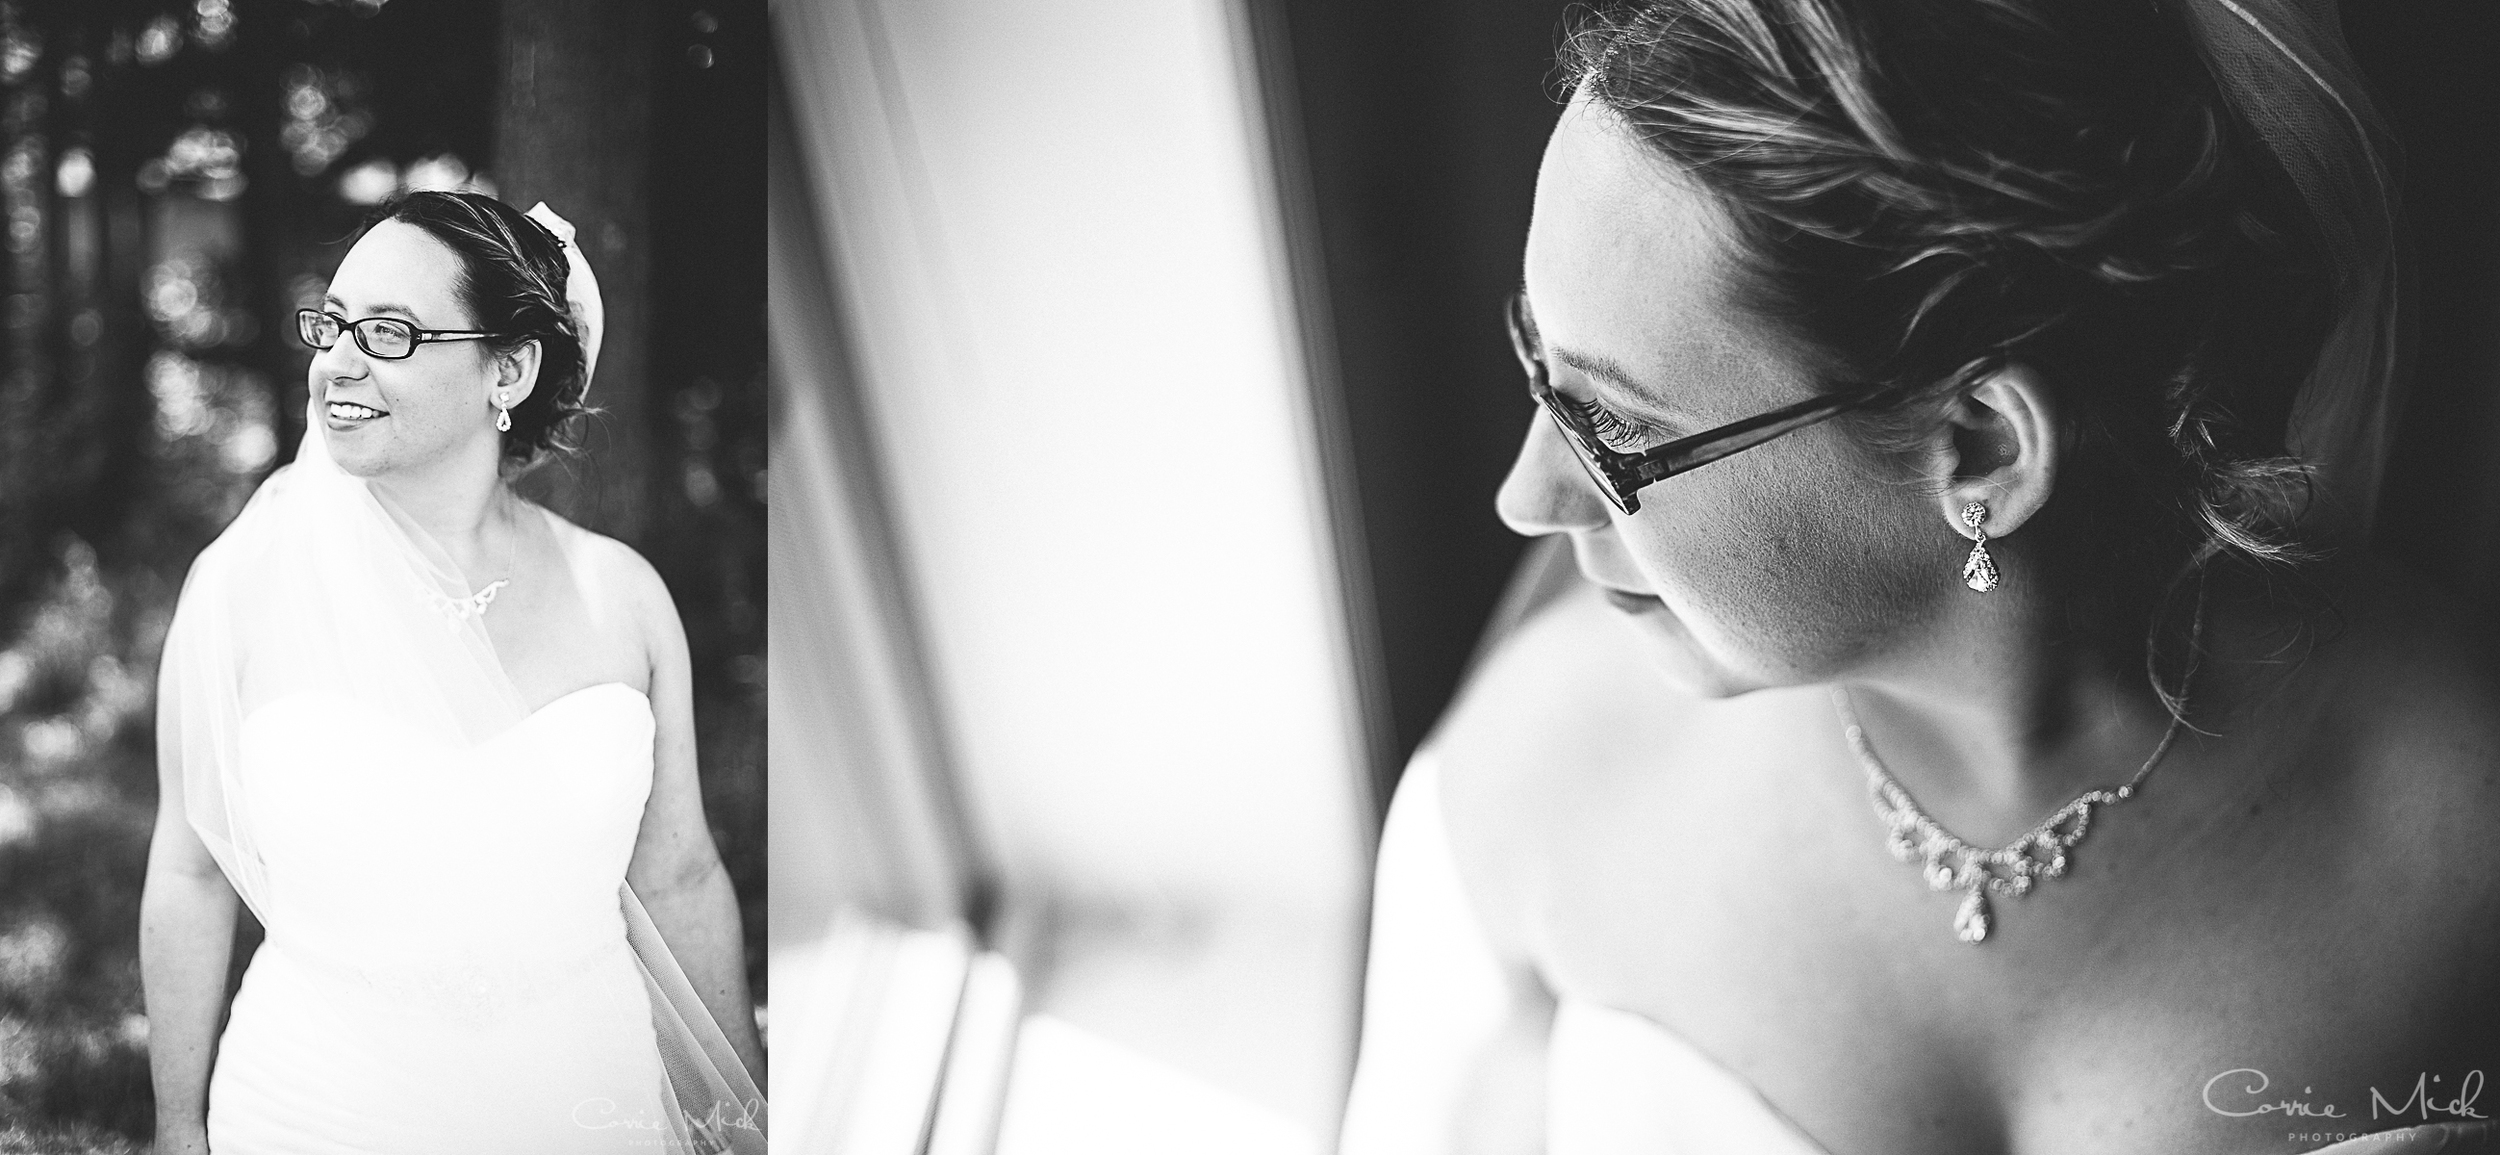 Rachel Black & White - Corrie Mick Photography.jpg